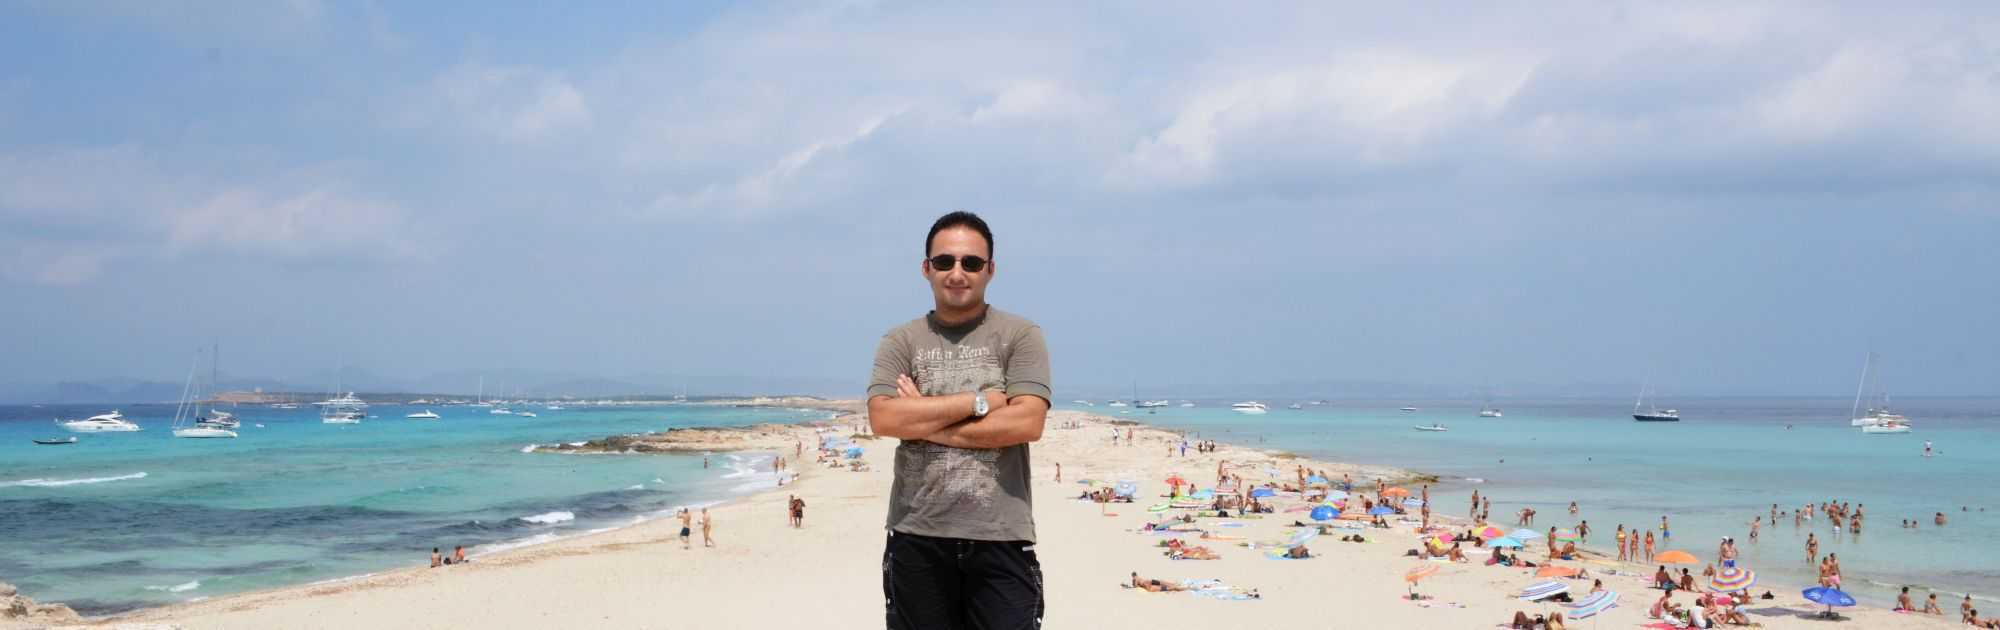 Playa de Ses Illetes - Formentera Adası